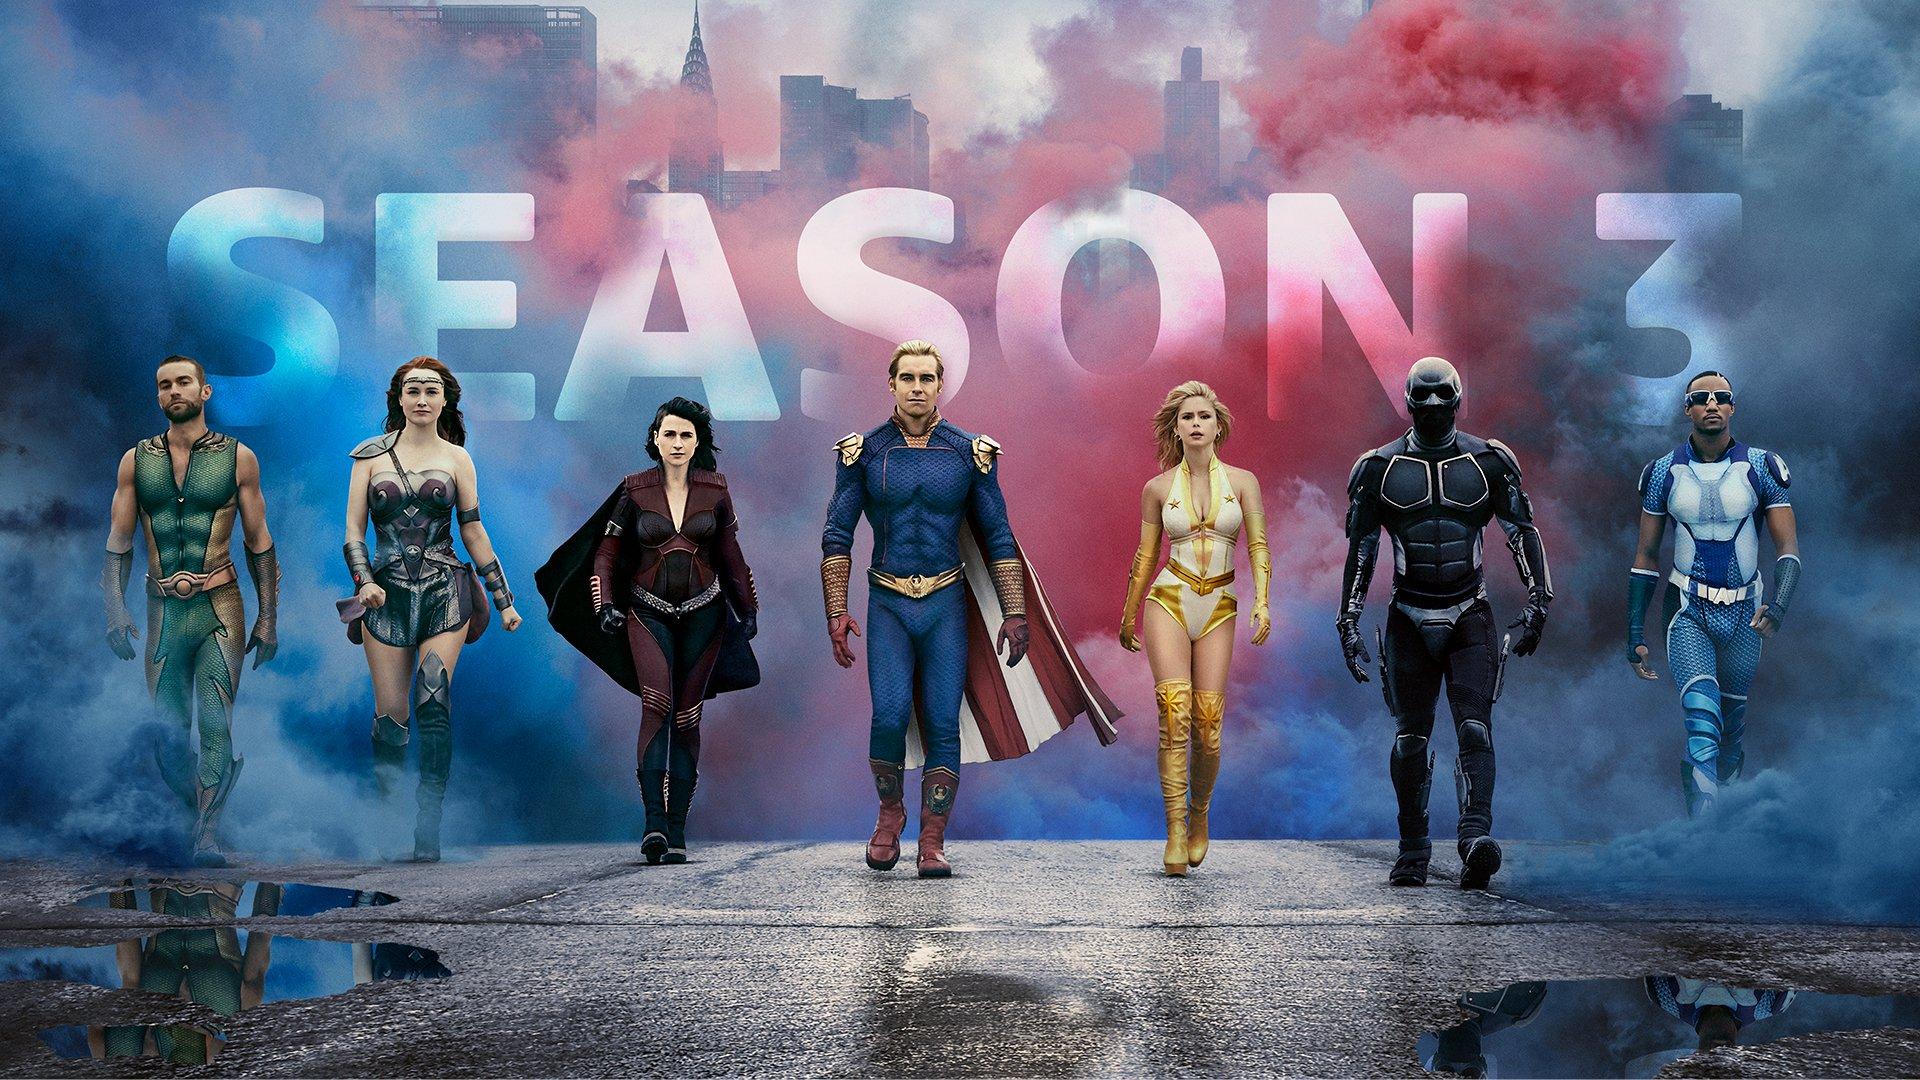 The Boys season 3 on Amazon Prime Video has already cast a new superhero |  TechRadar